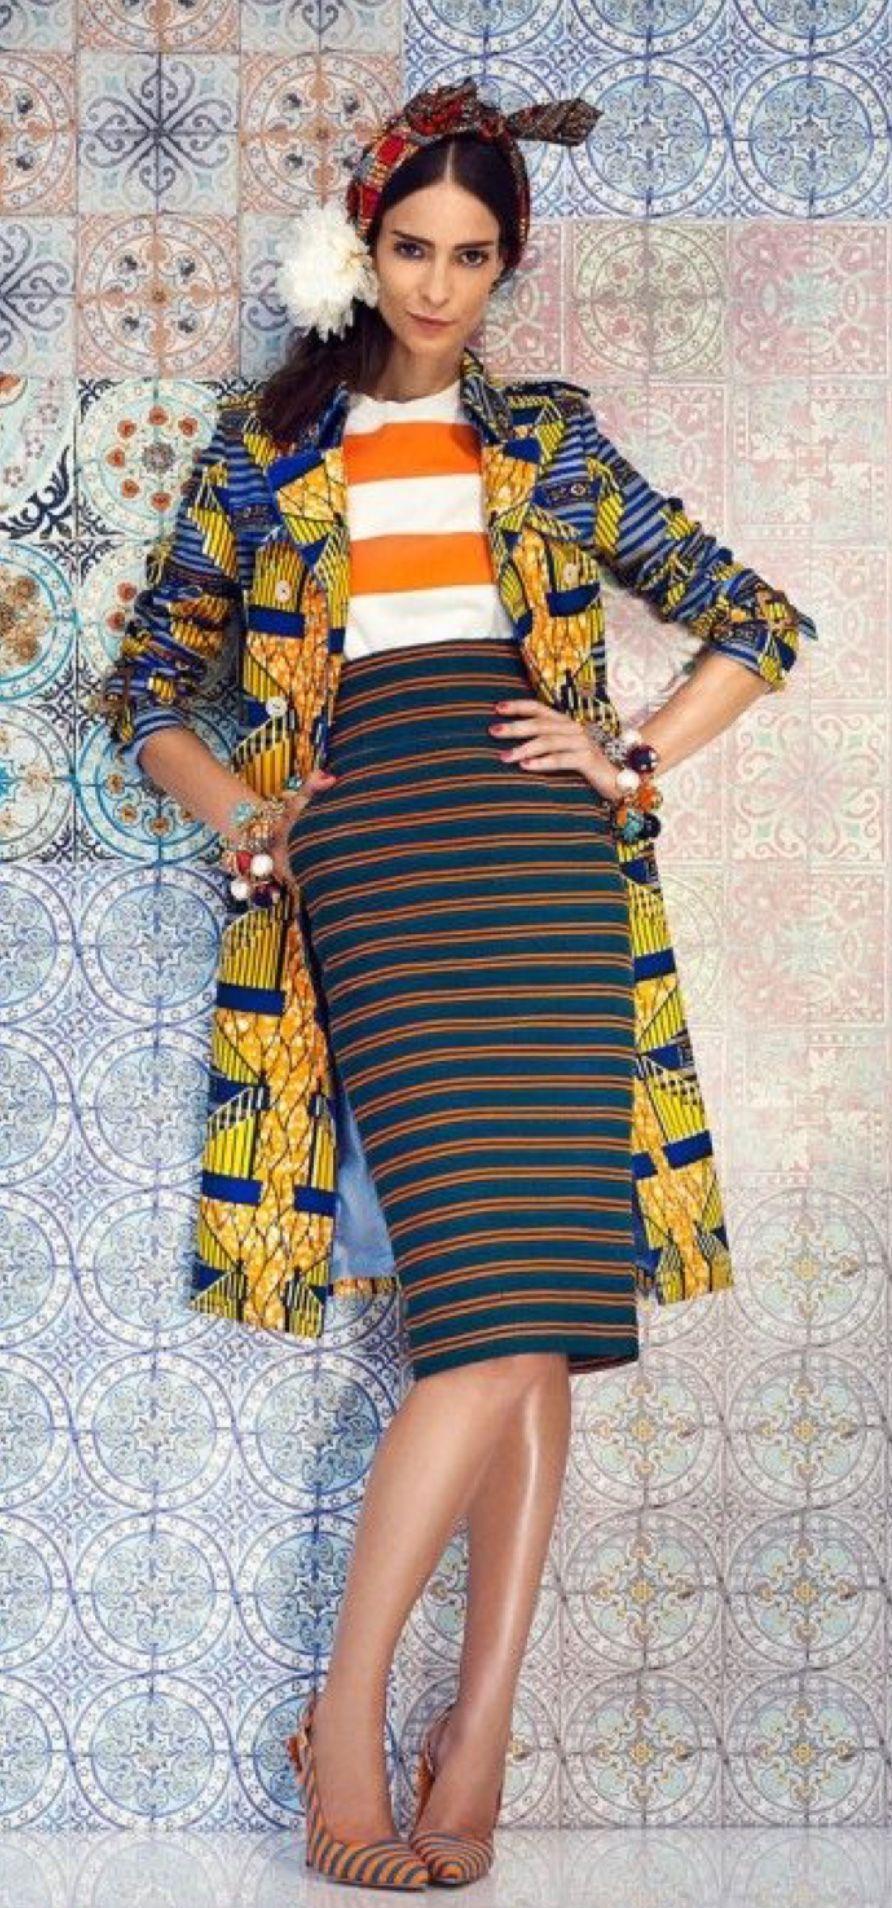 #afrikanischerstil #afrikanischerstil #afrikanischerstil #afrikanischerstil #afrikanischerstil #afrikanischerstil #afrikanischerstil #afrikanischerstil